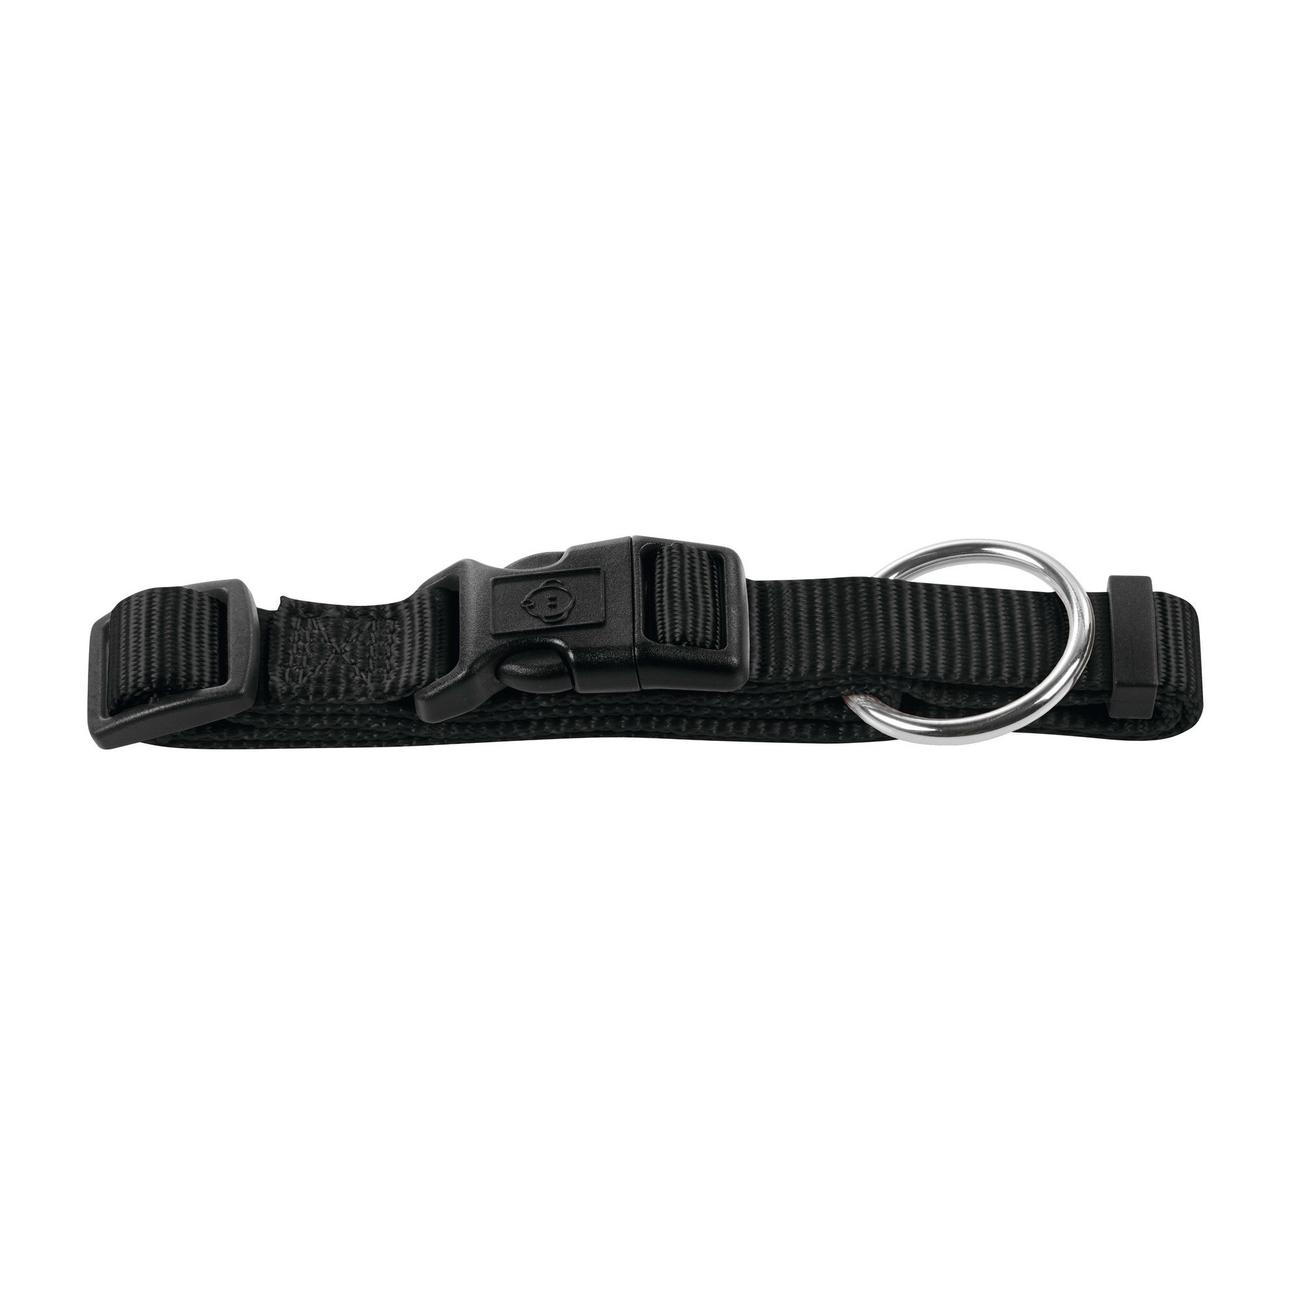 Hunter Halsband Nylon Halsung Ecco Sport Vario Plus 91000, Bild 3